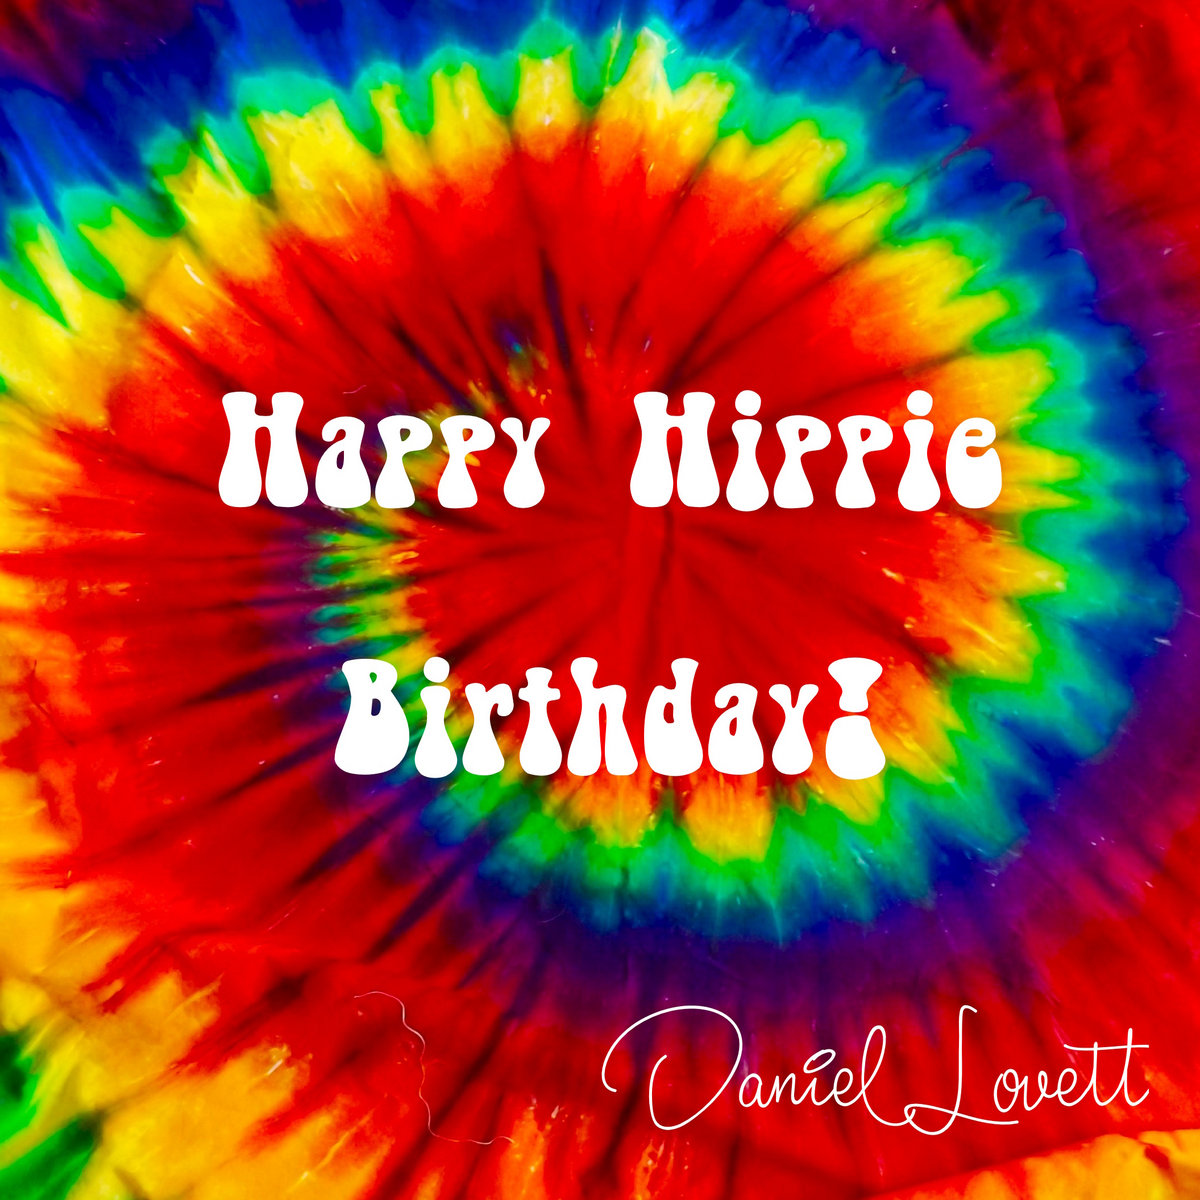 hippie happy birthday Happy Hippie Birthday! | Reflect hippie happy birthday